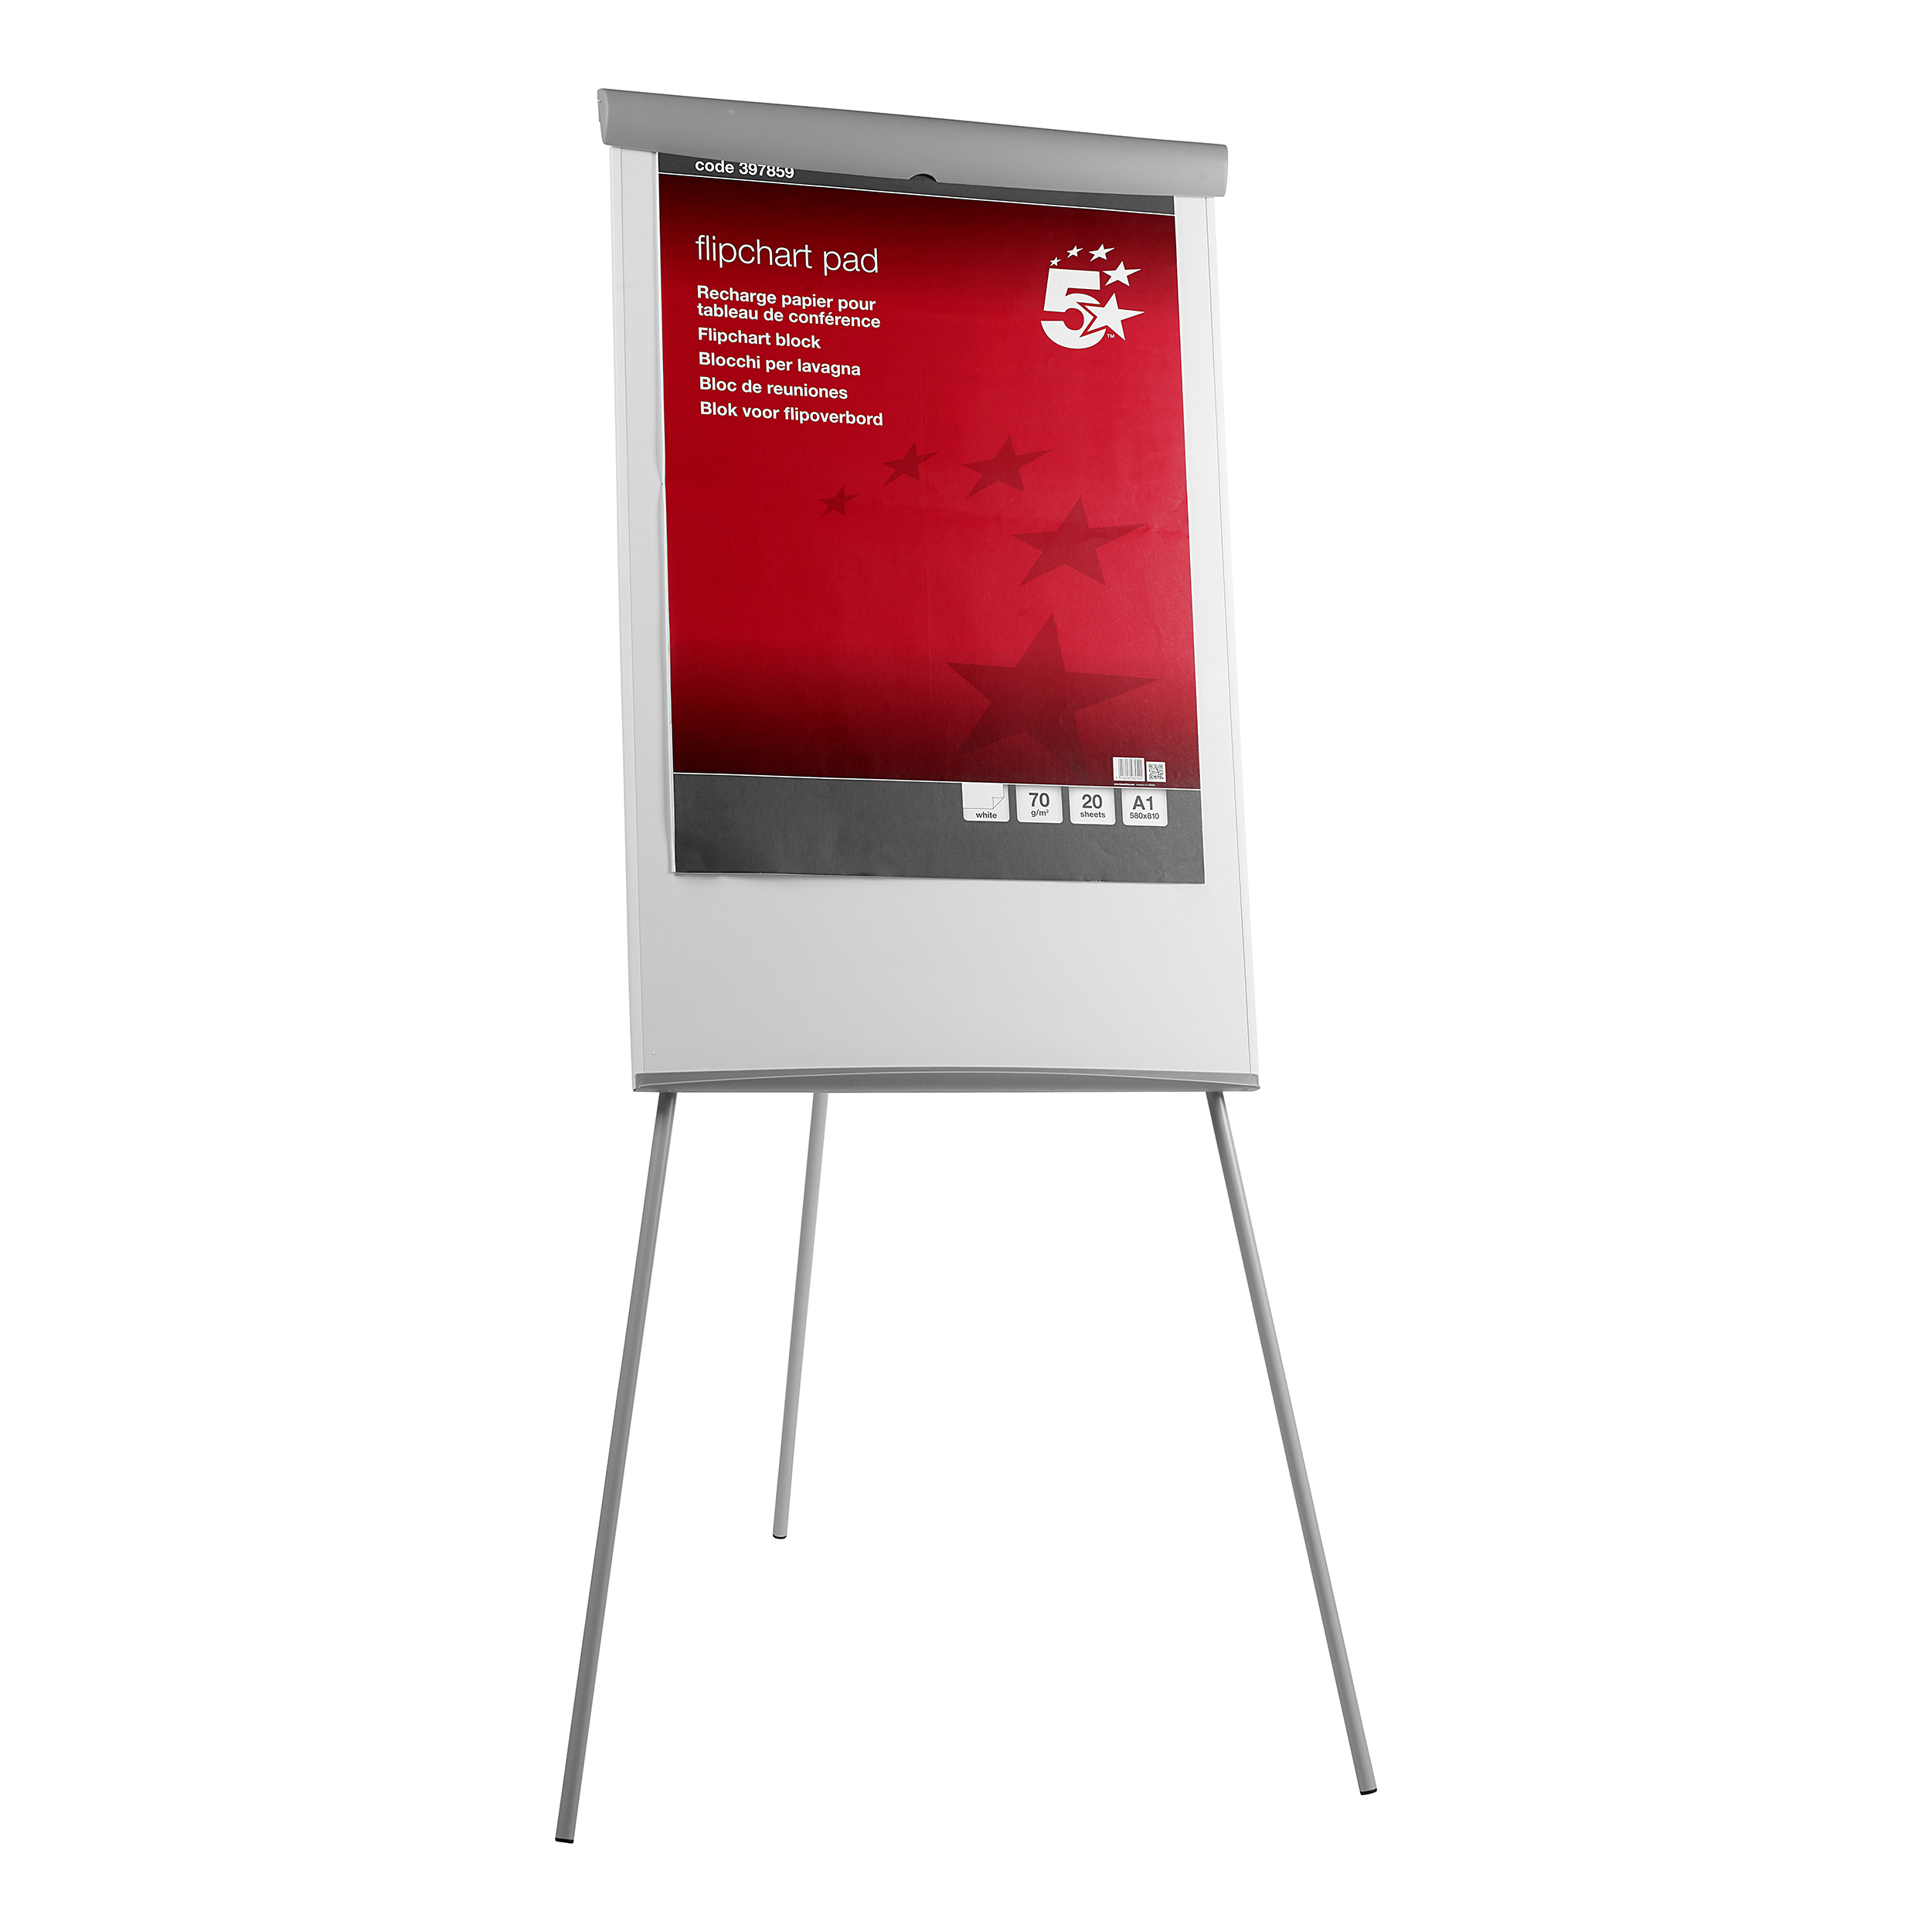 5 Star Office Flipchart Easel with W670xH990mm Board W700xD82xH1900mm